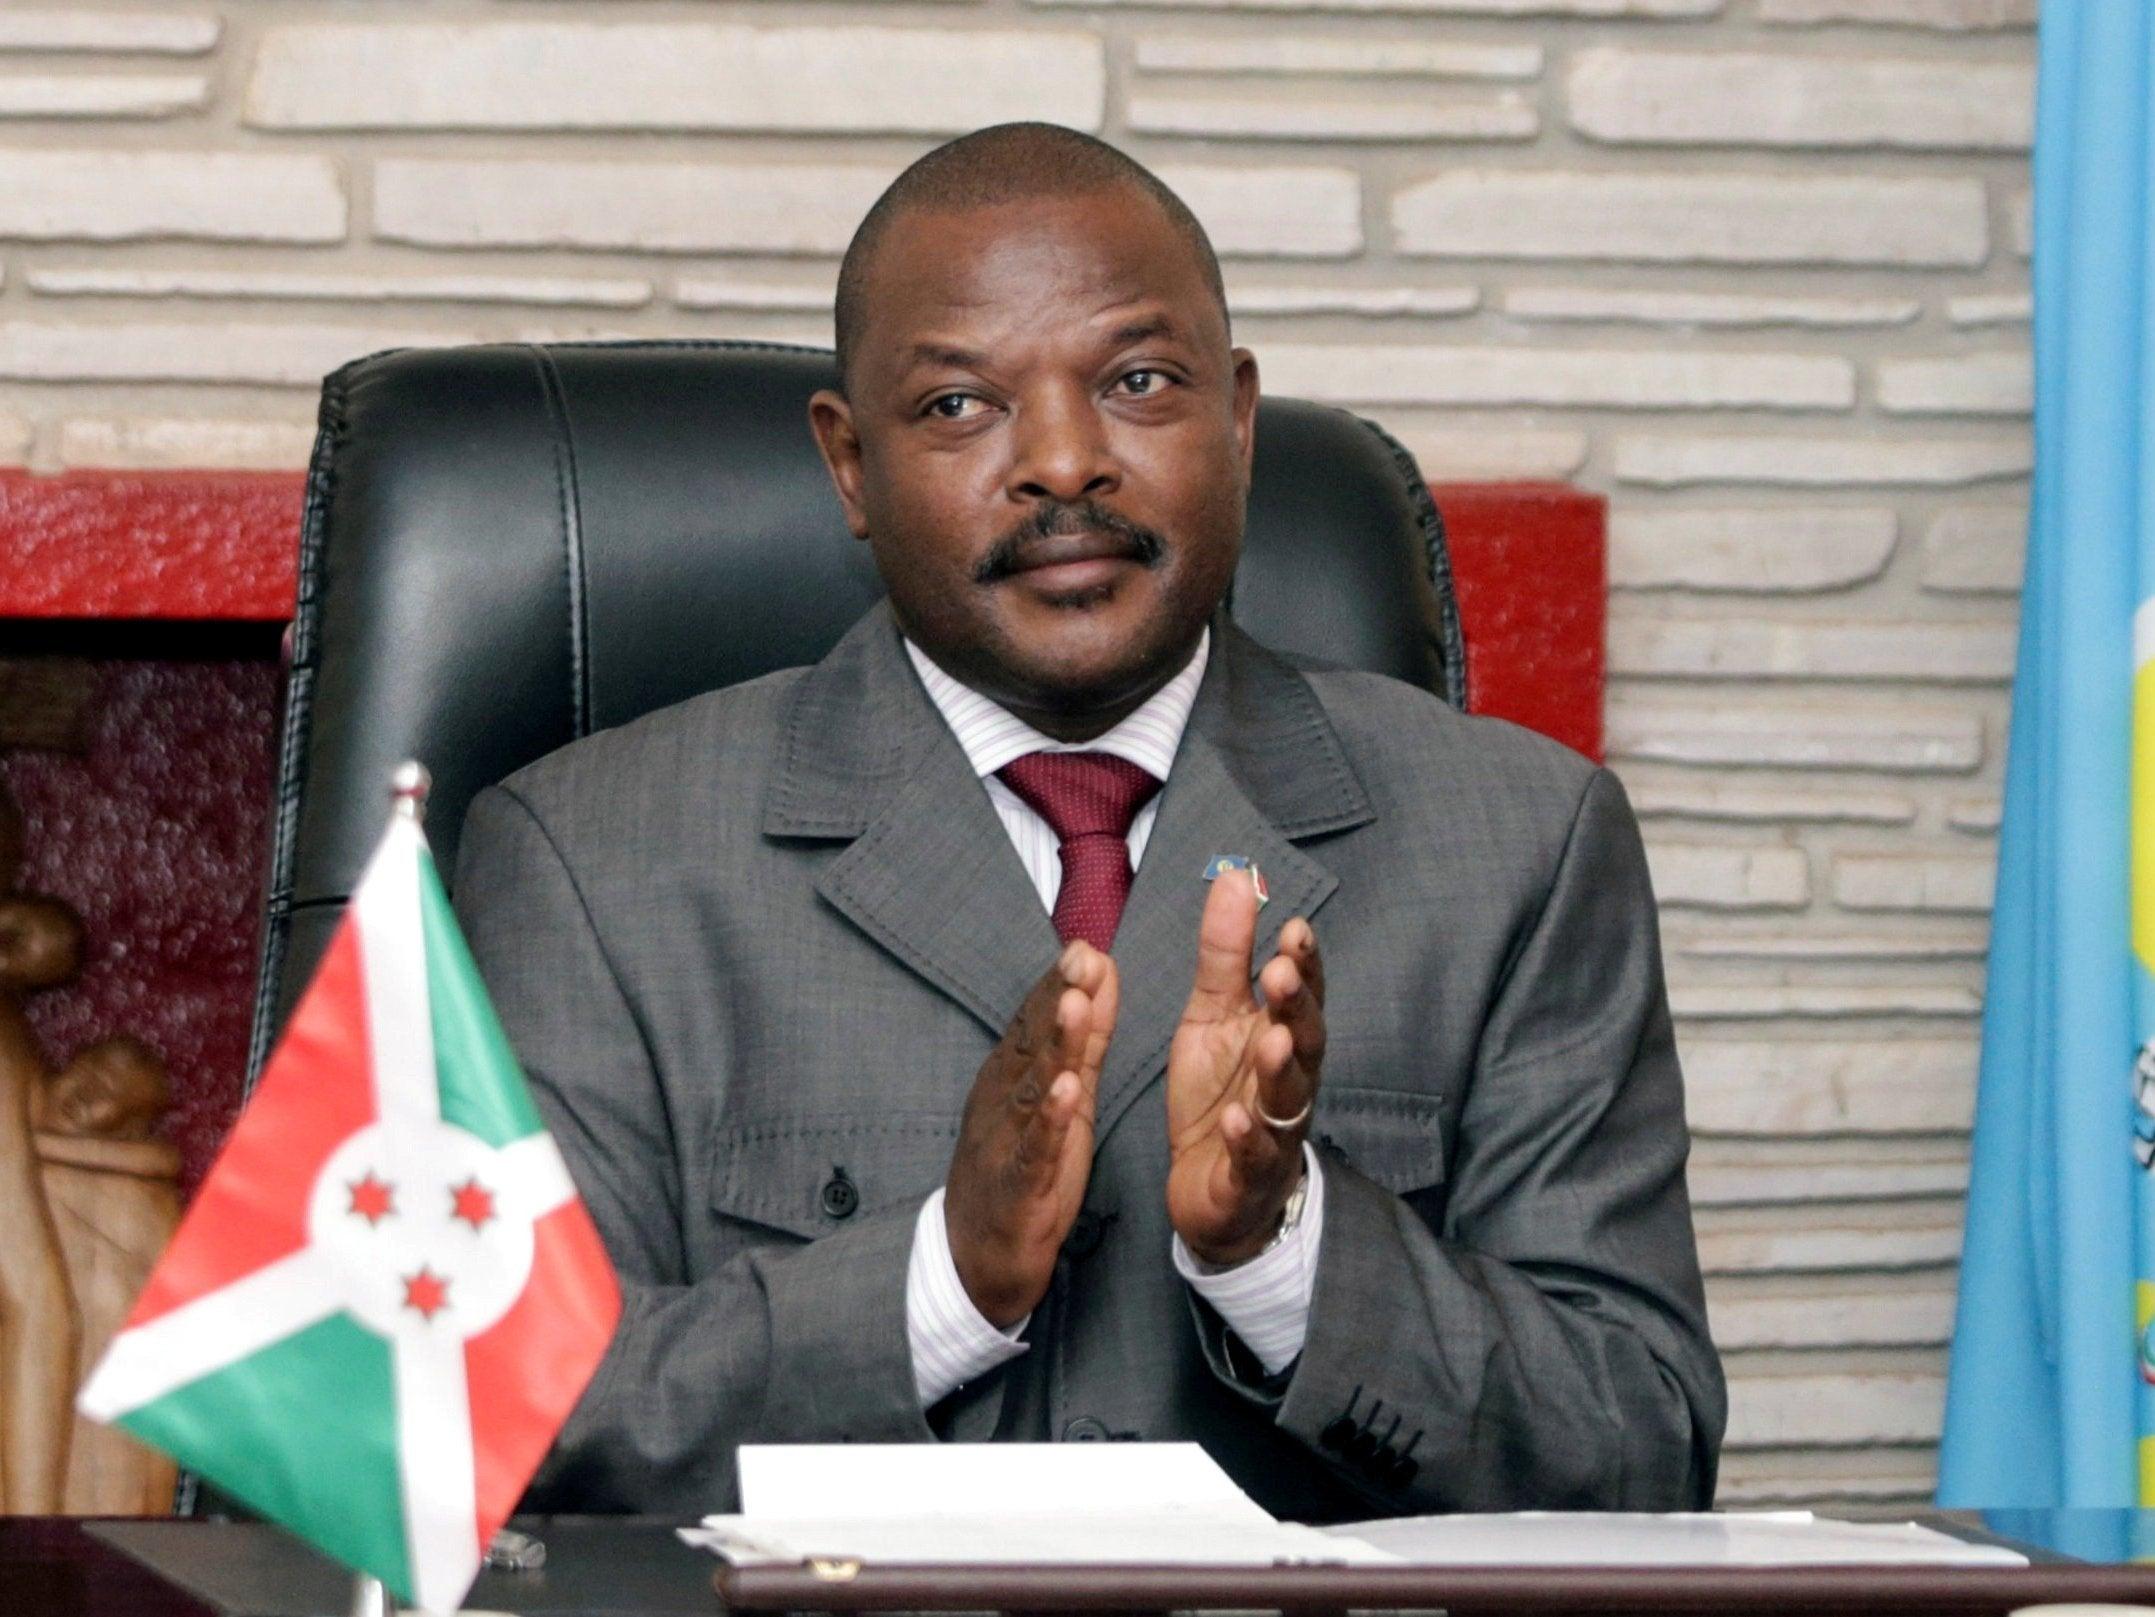 REAL Cause Of Death Of Burundi's President, Pierre Nkurunziza